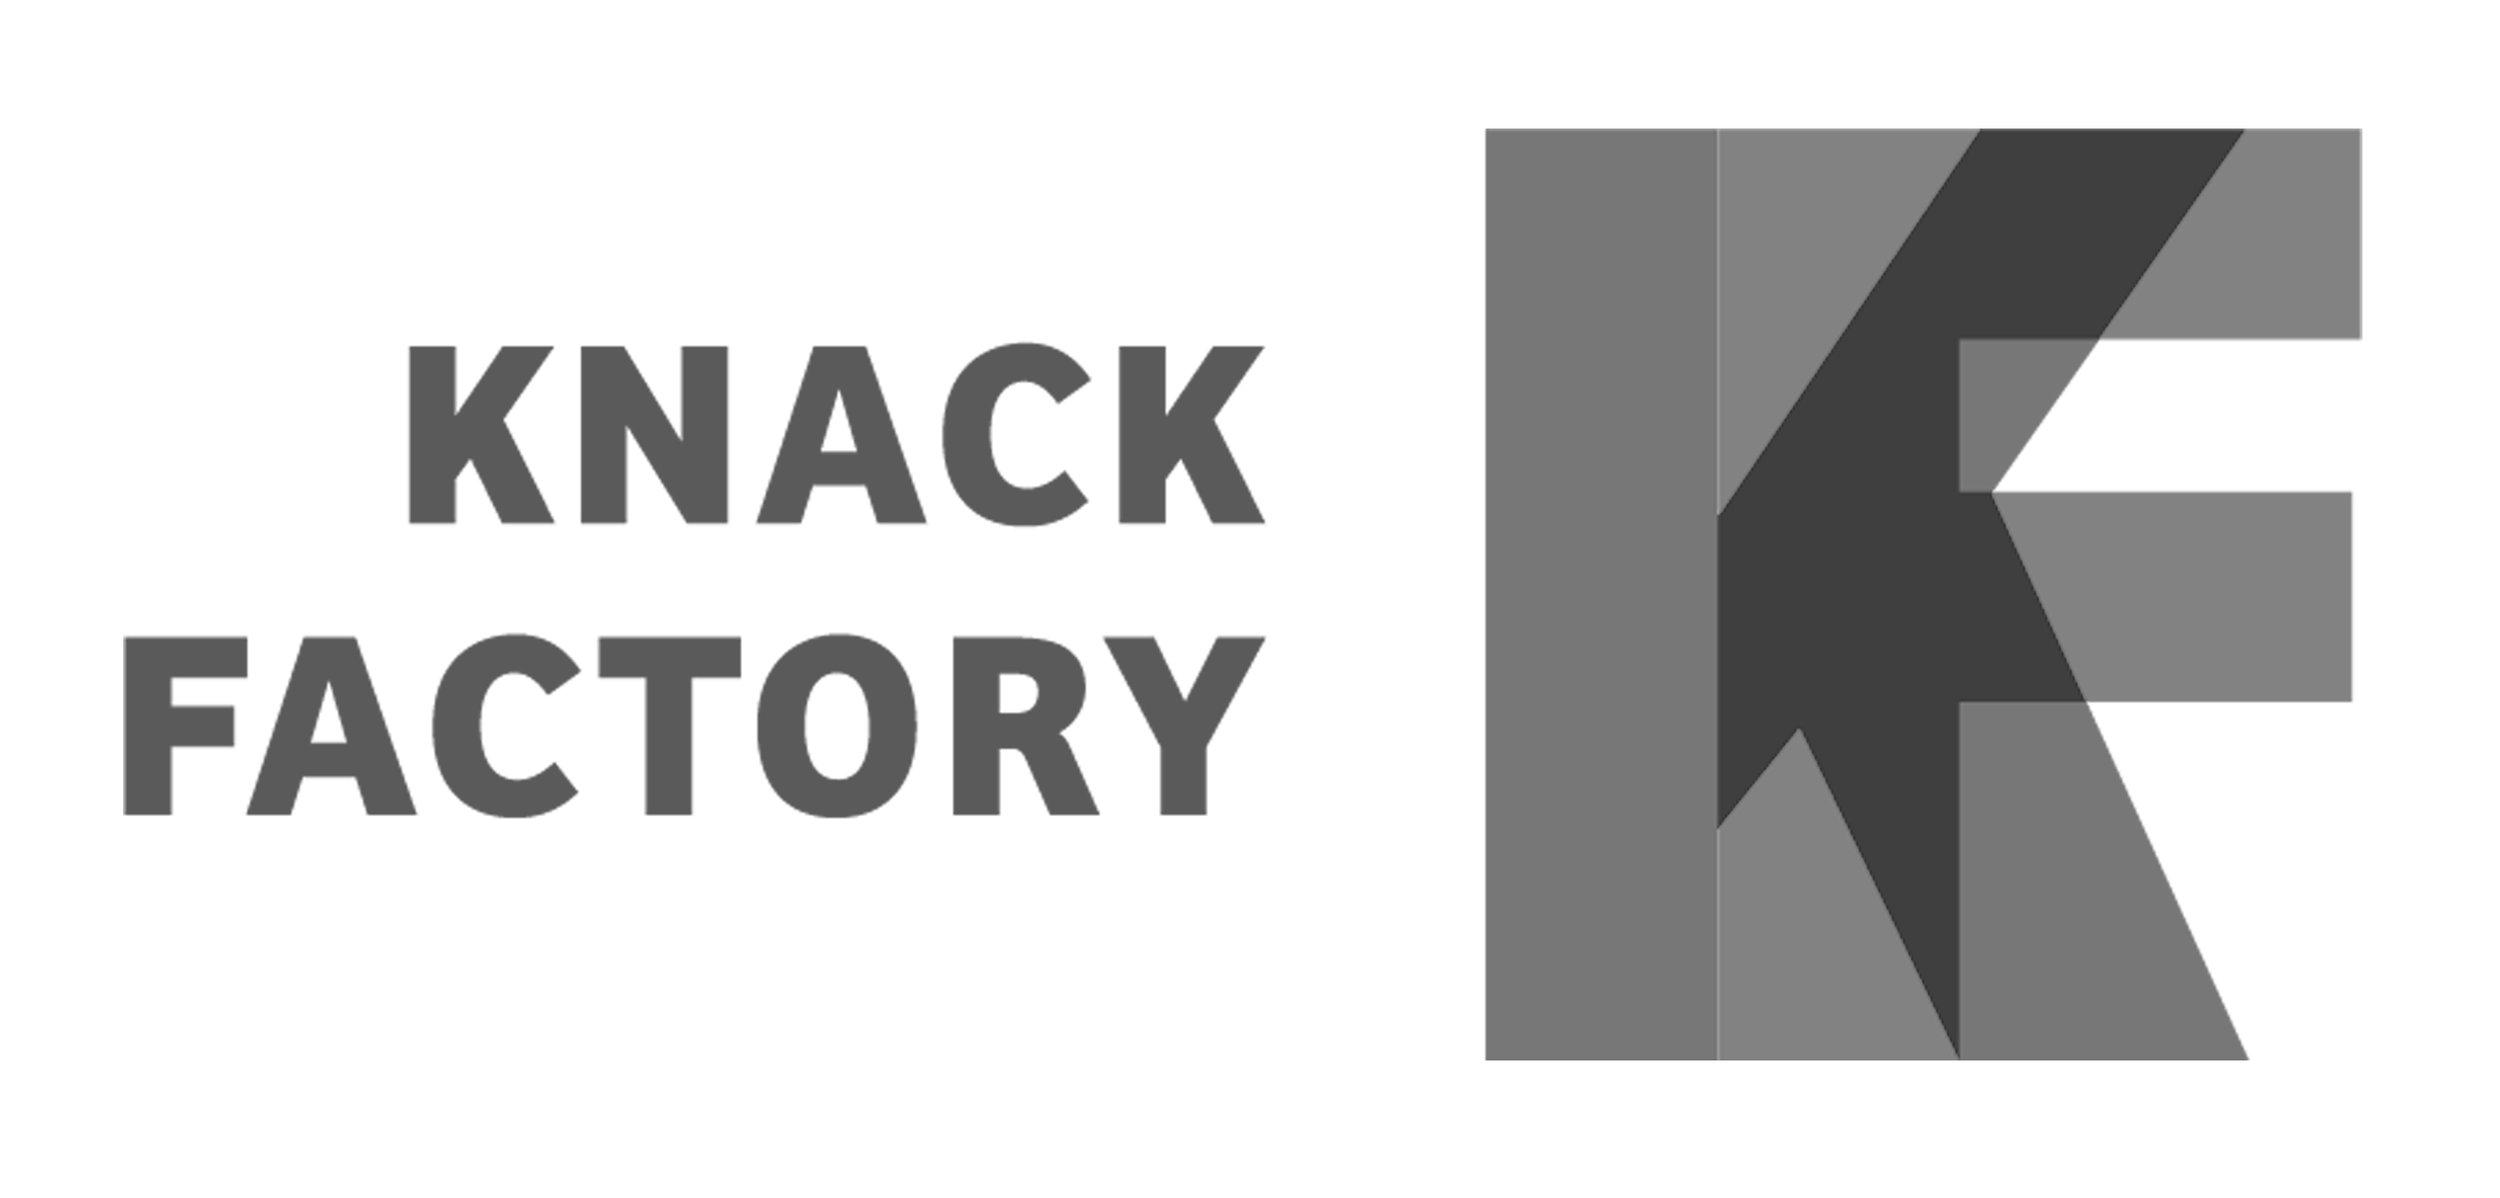 Knack Factory.jpg